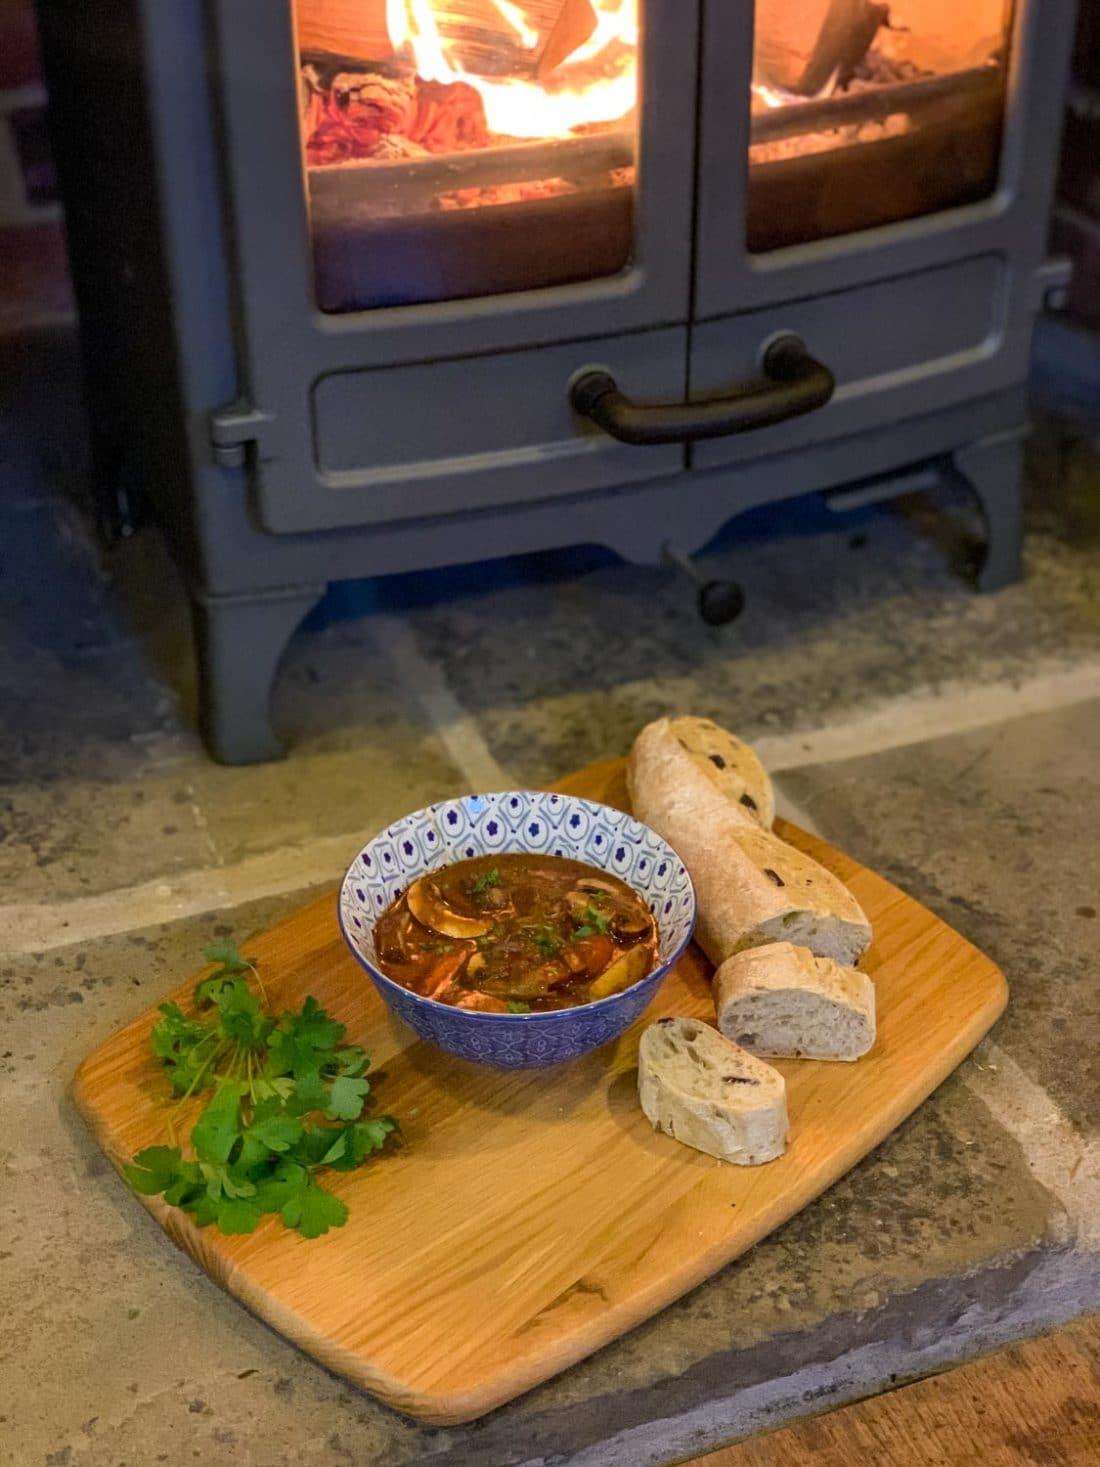 beef stew on the log burner charnwood island 1